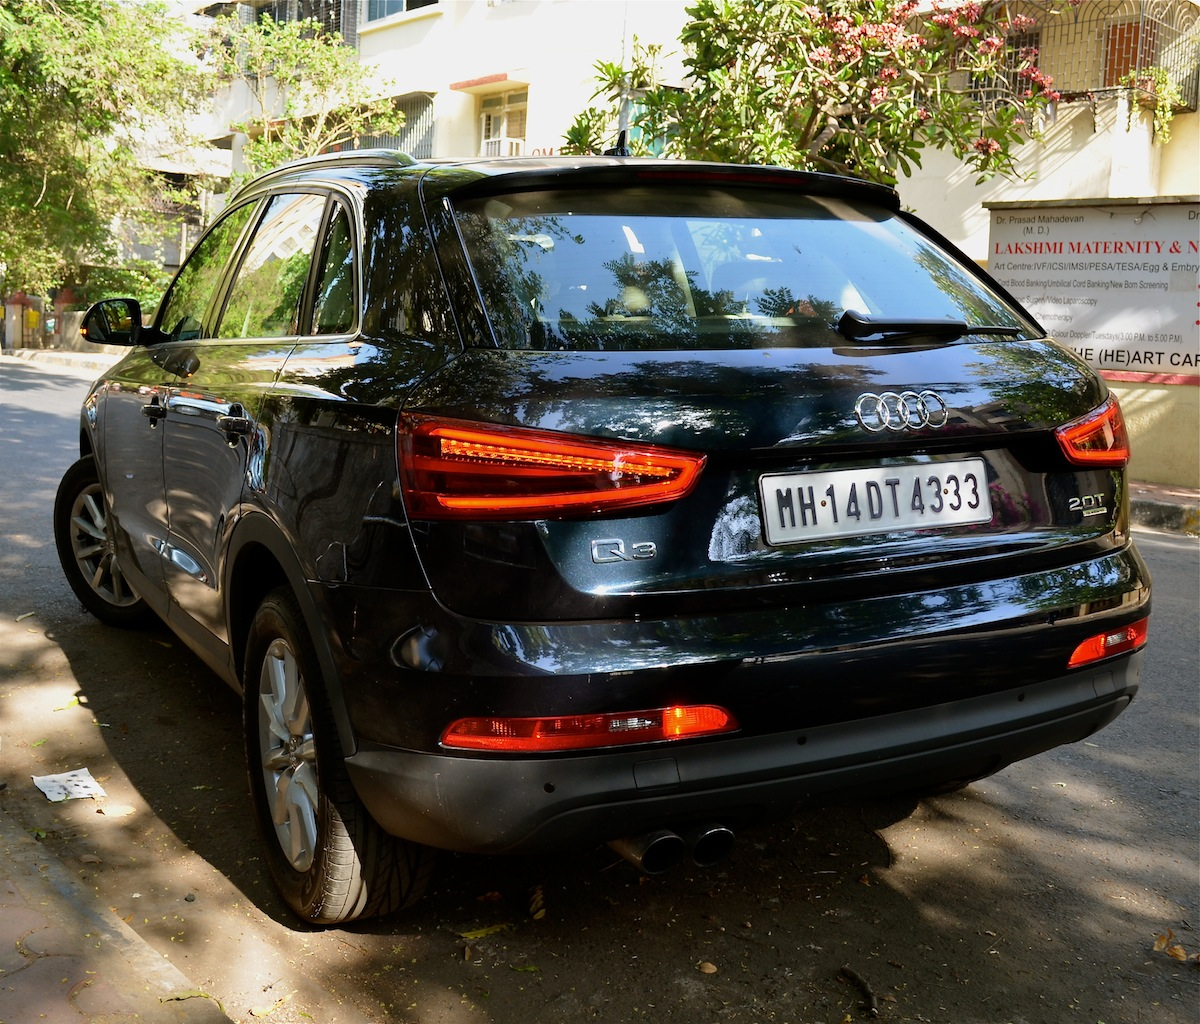 Review Of The Petrol Audi Q3 2.0 TFSI